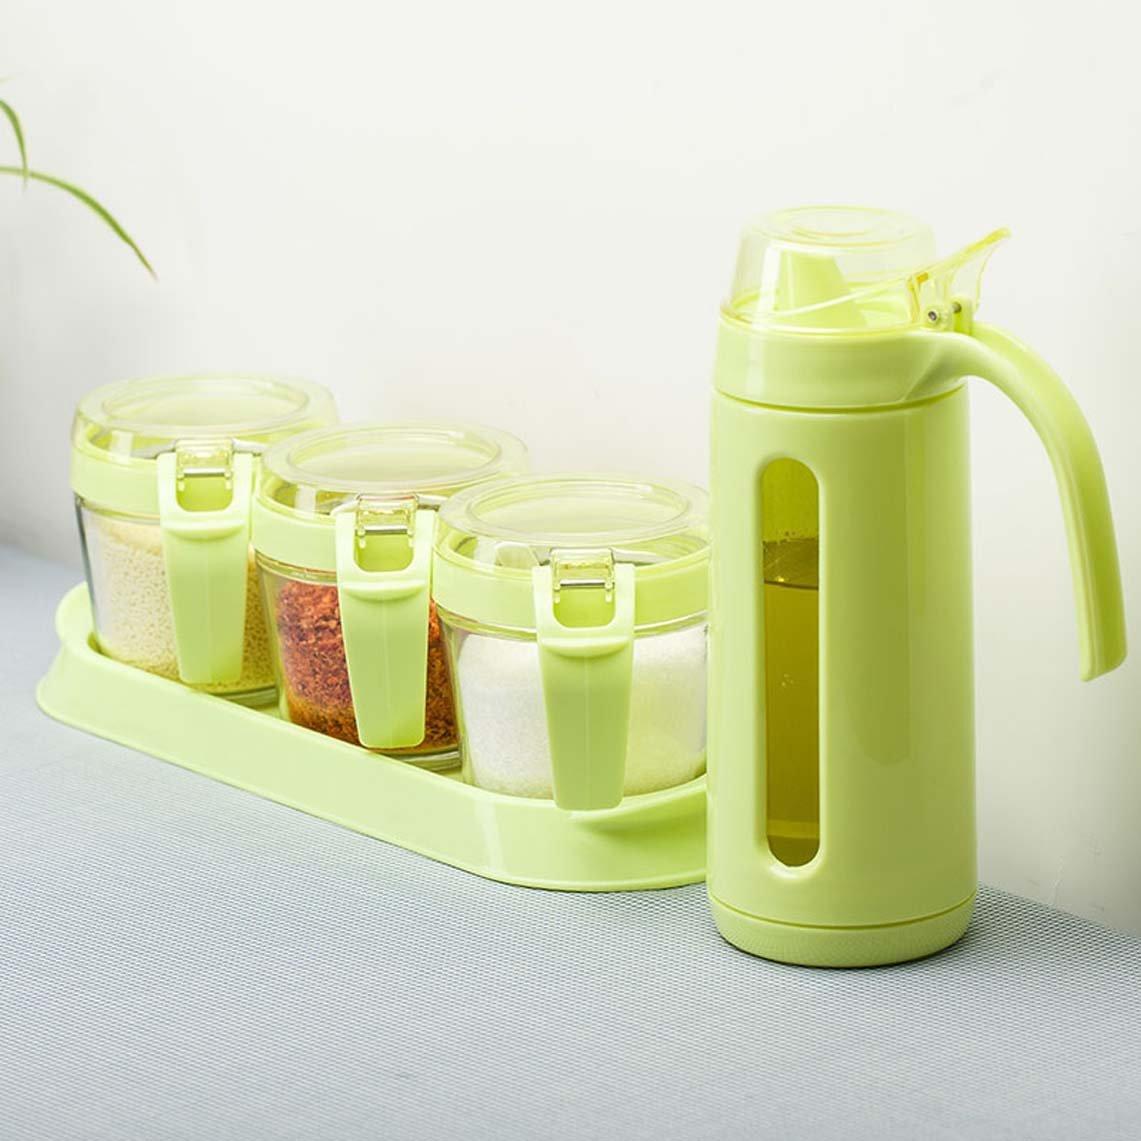 ZFDM Glass Seasoning Jar Set Kitchen Seasoning Box Seasoning Jar Set Oil Pot Salt Shaker With Spoon Set